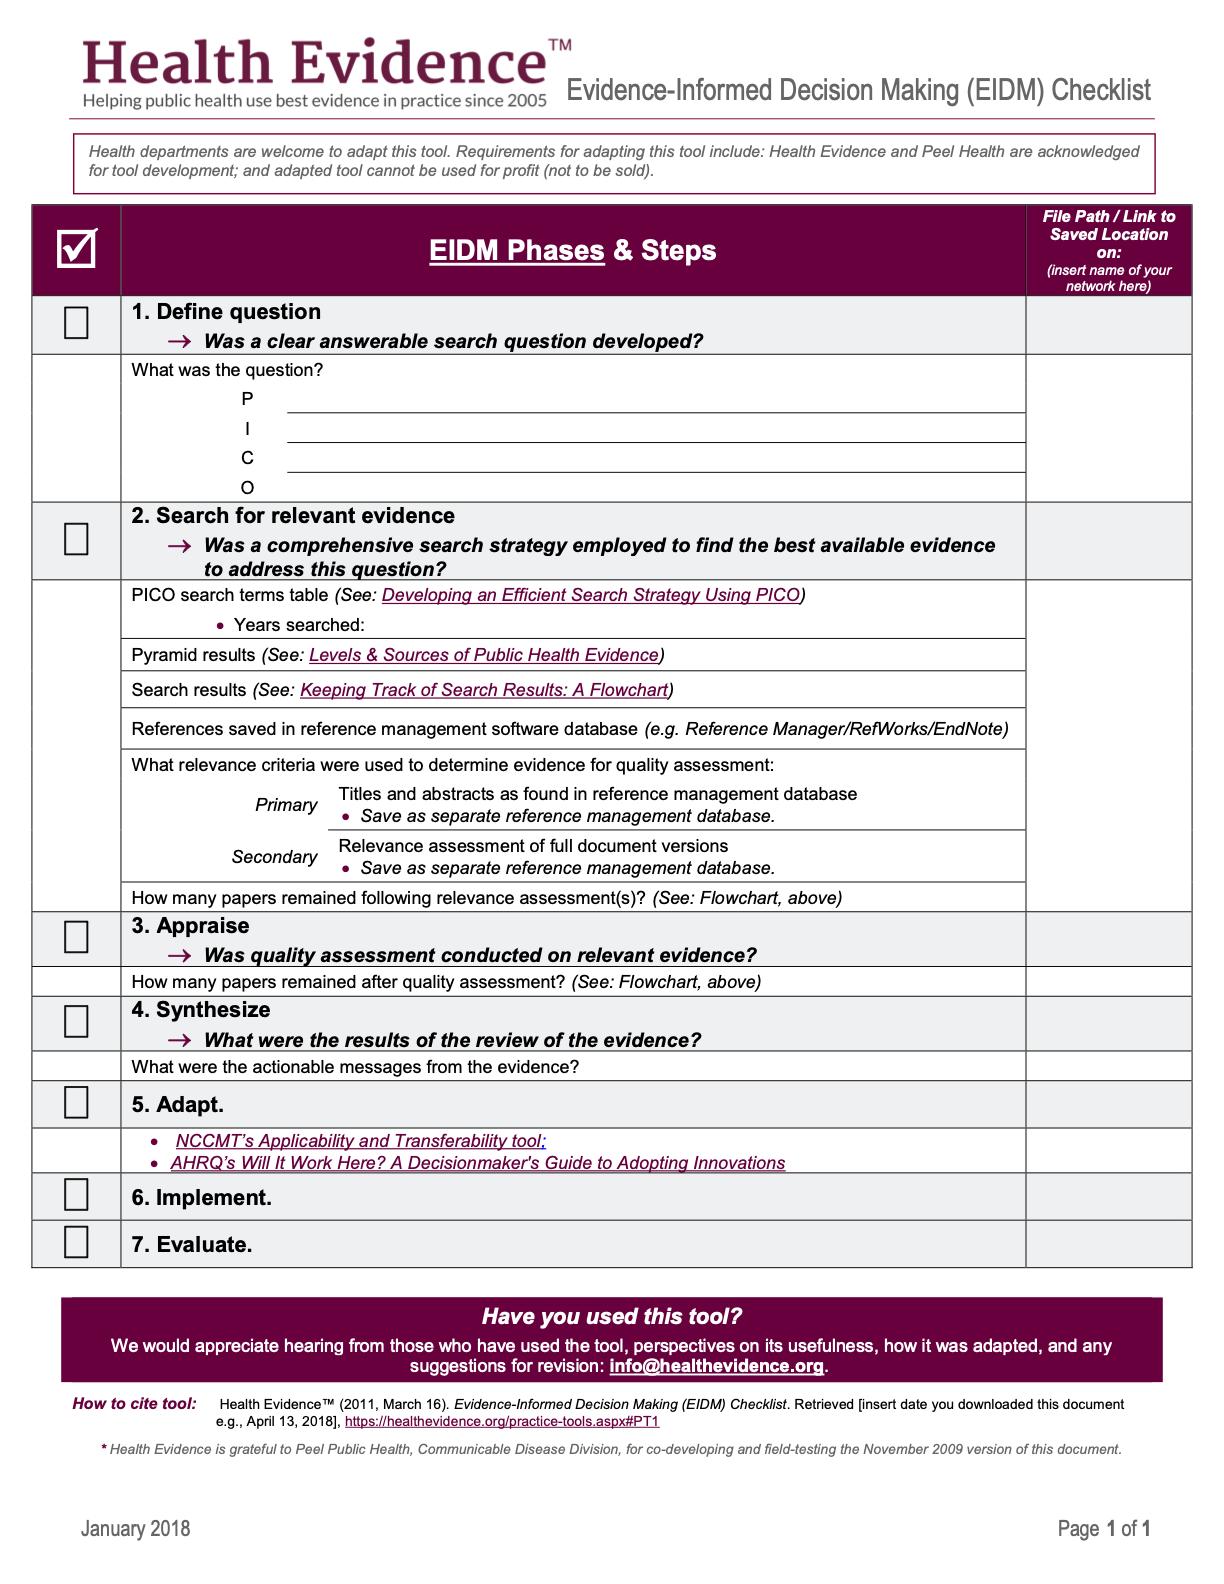 Evidence-Informed Decision Making (EIDM) Checklist